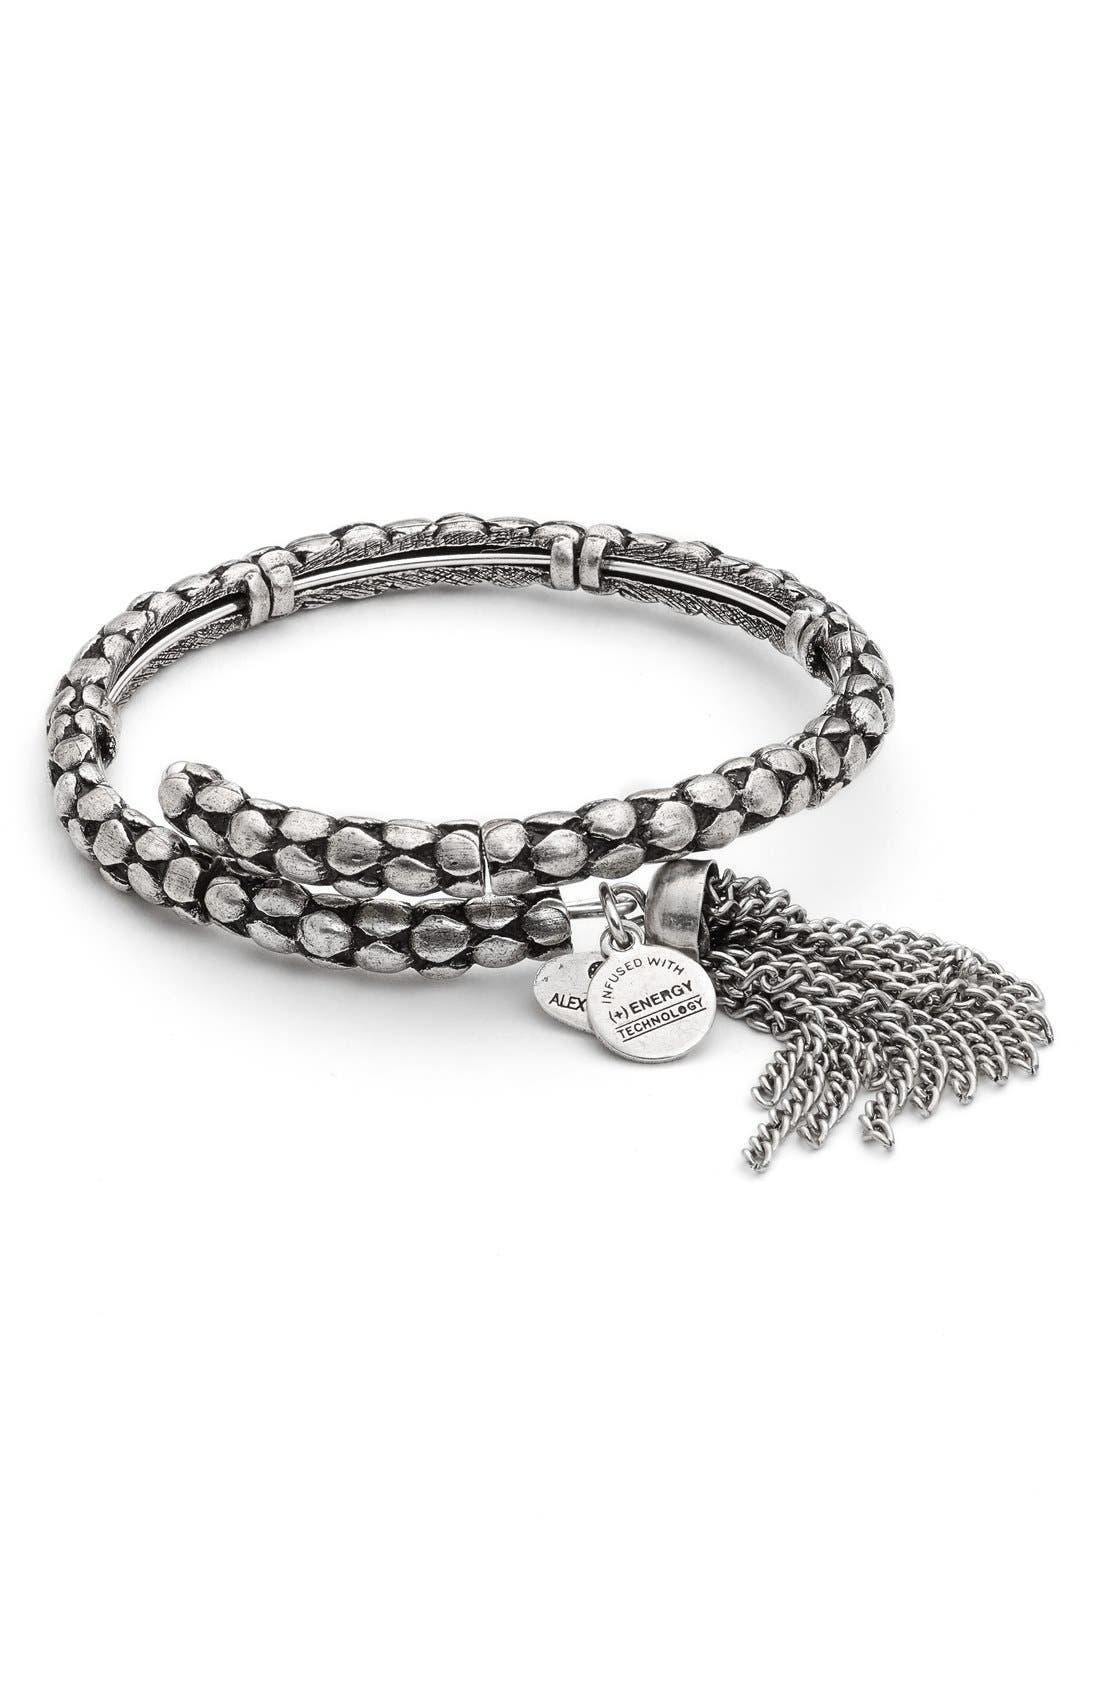 Tassel Coil Bracelet,                             Main thumbnail 1, color,                             Silver